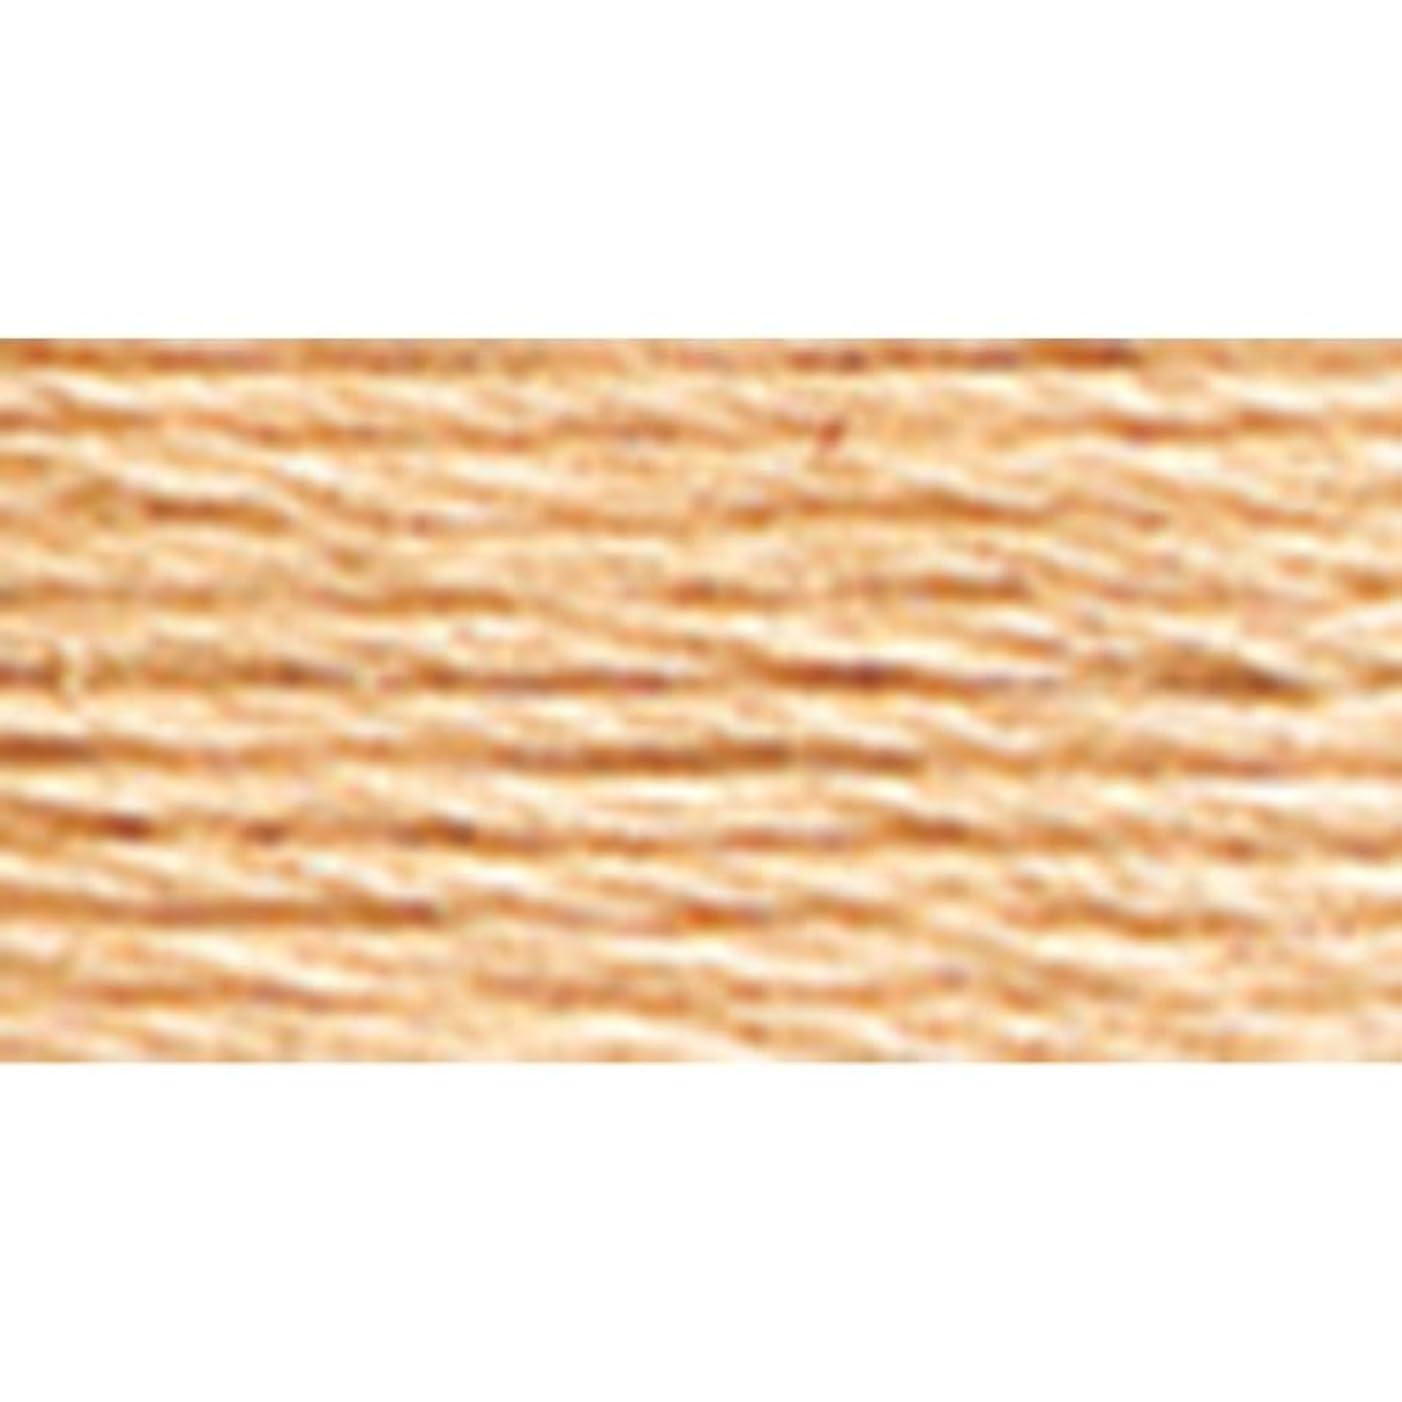 DMC 116 8-945 Pearl Cotton Thread Balls, Tawny, Size 8